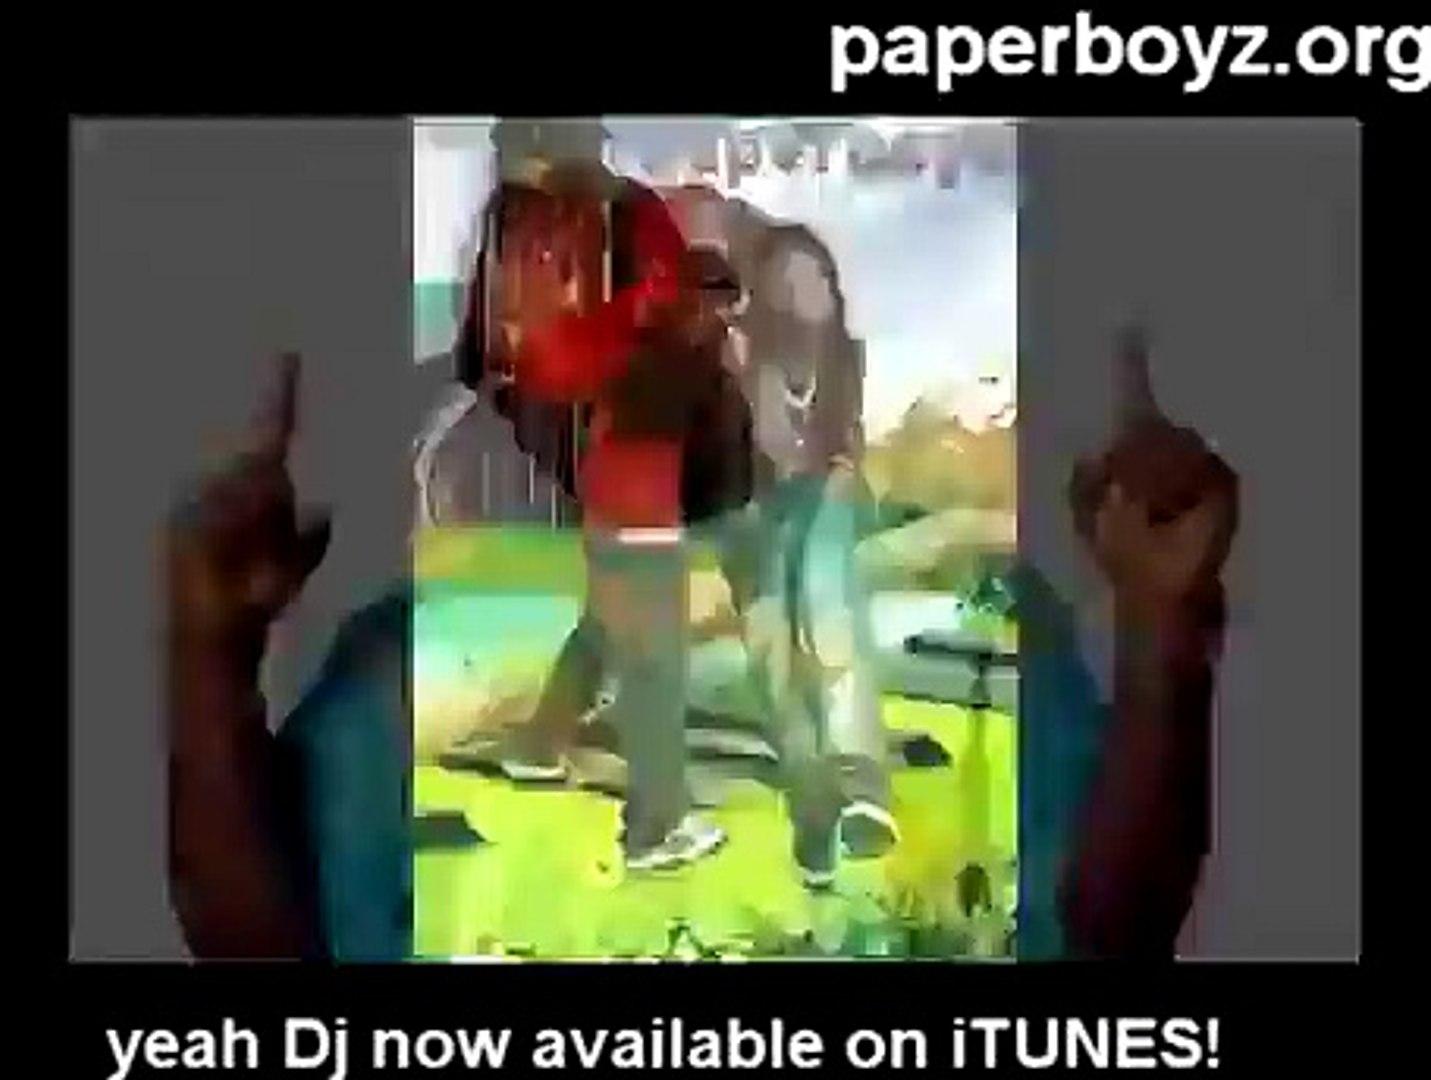 Young Paperboyz Ft Hardx - Yeah Dj [Nigeria Music]